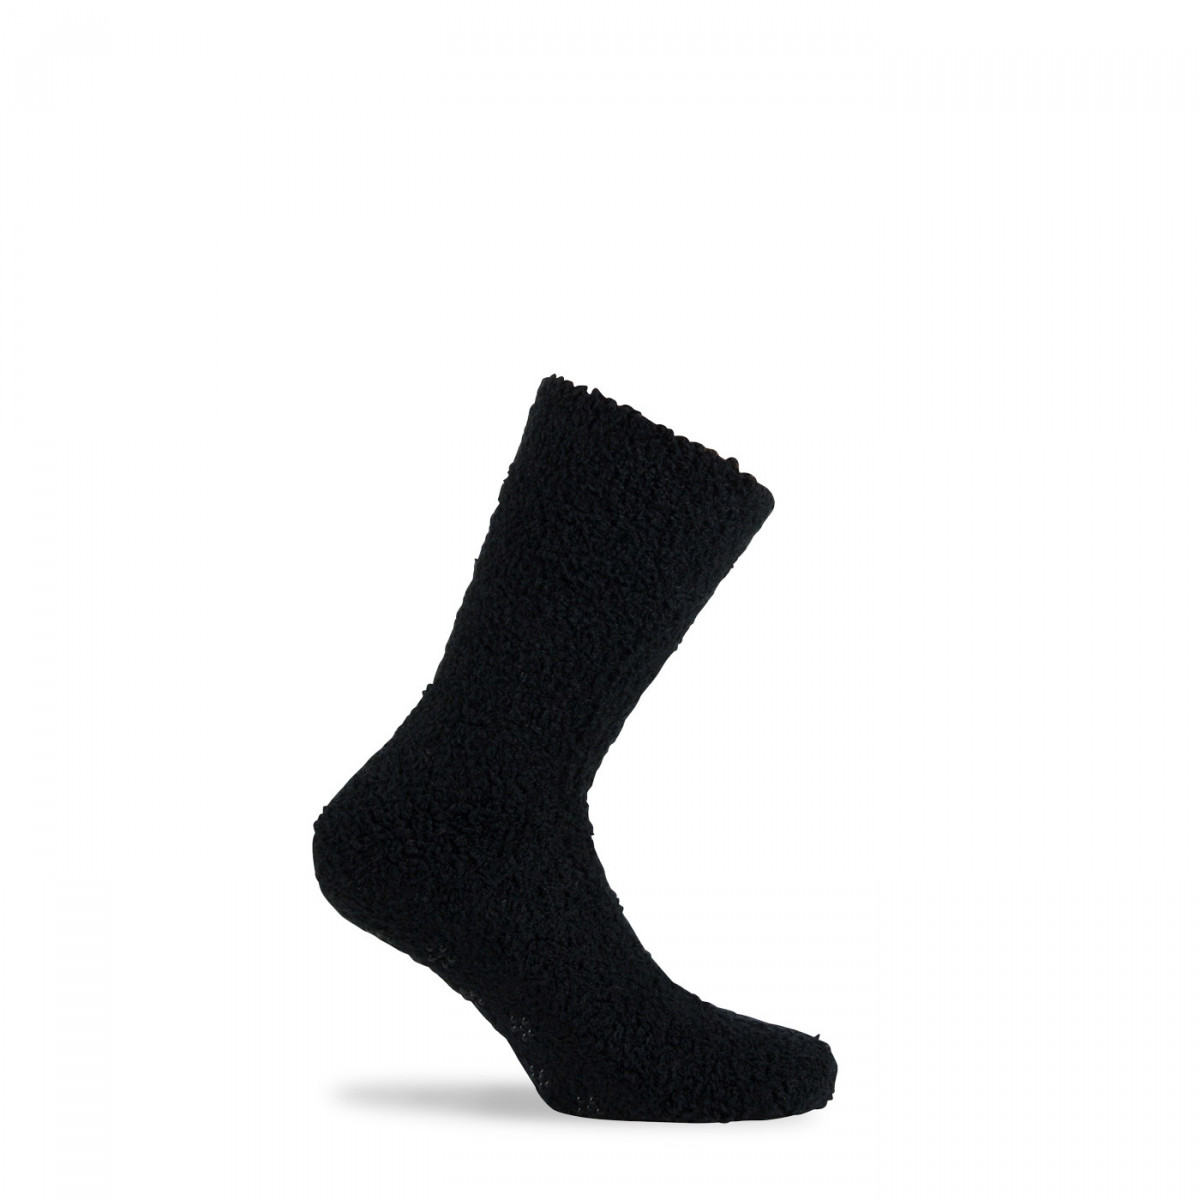 magasin en ligne 02b21 b2022 Chaussettes antidérapantes cocooning - Chaussettes Femme | Kindy